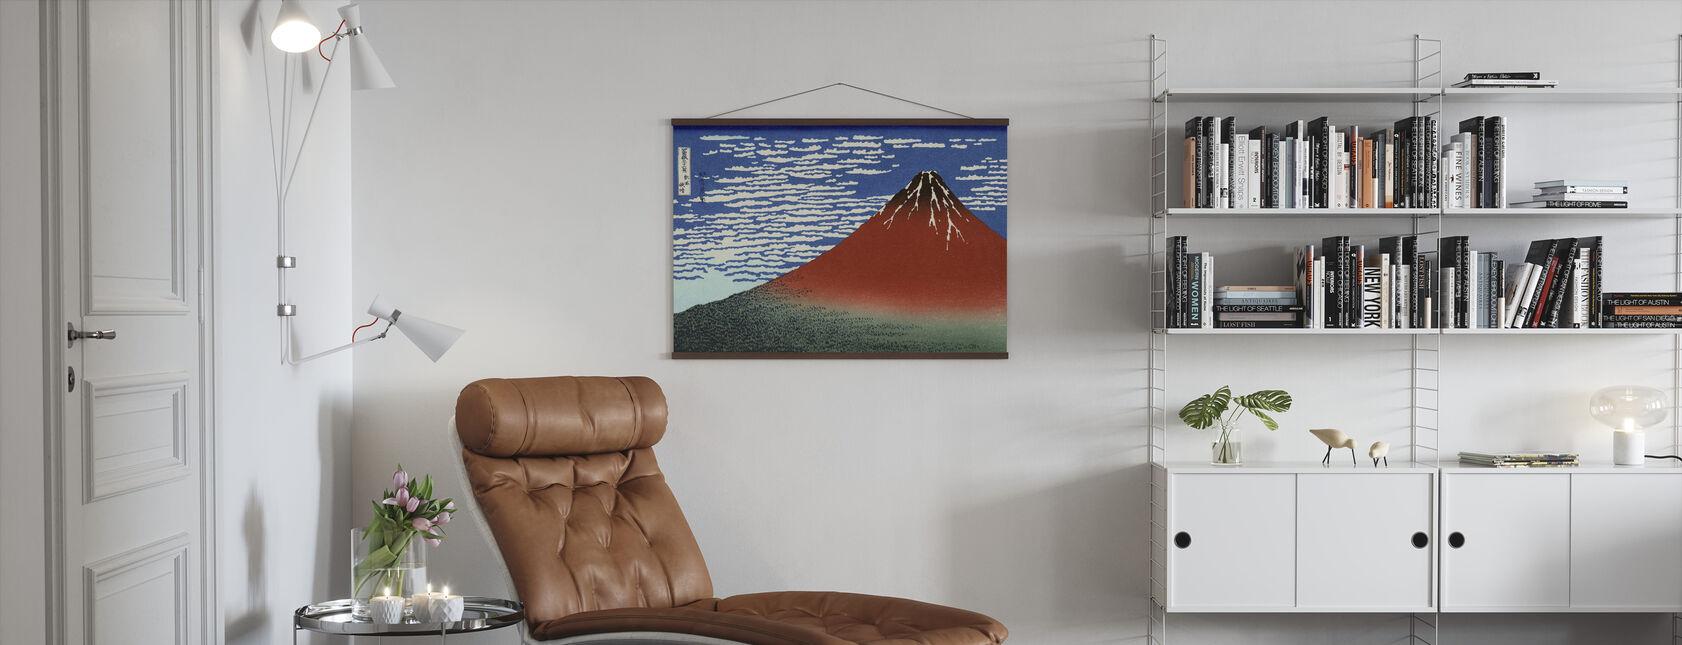 Red Fuji, Katsushika Hokusai - Juliste - Olohuone